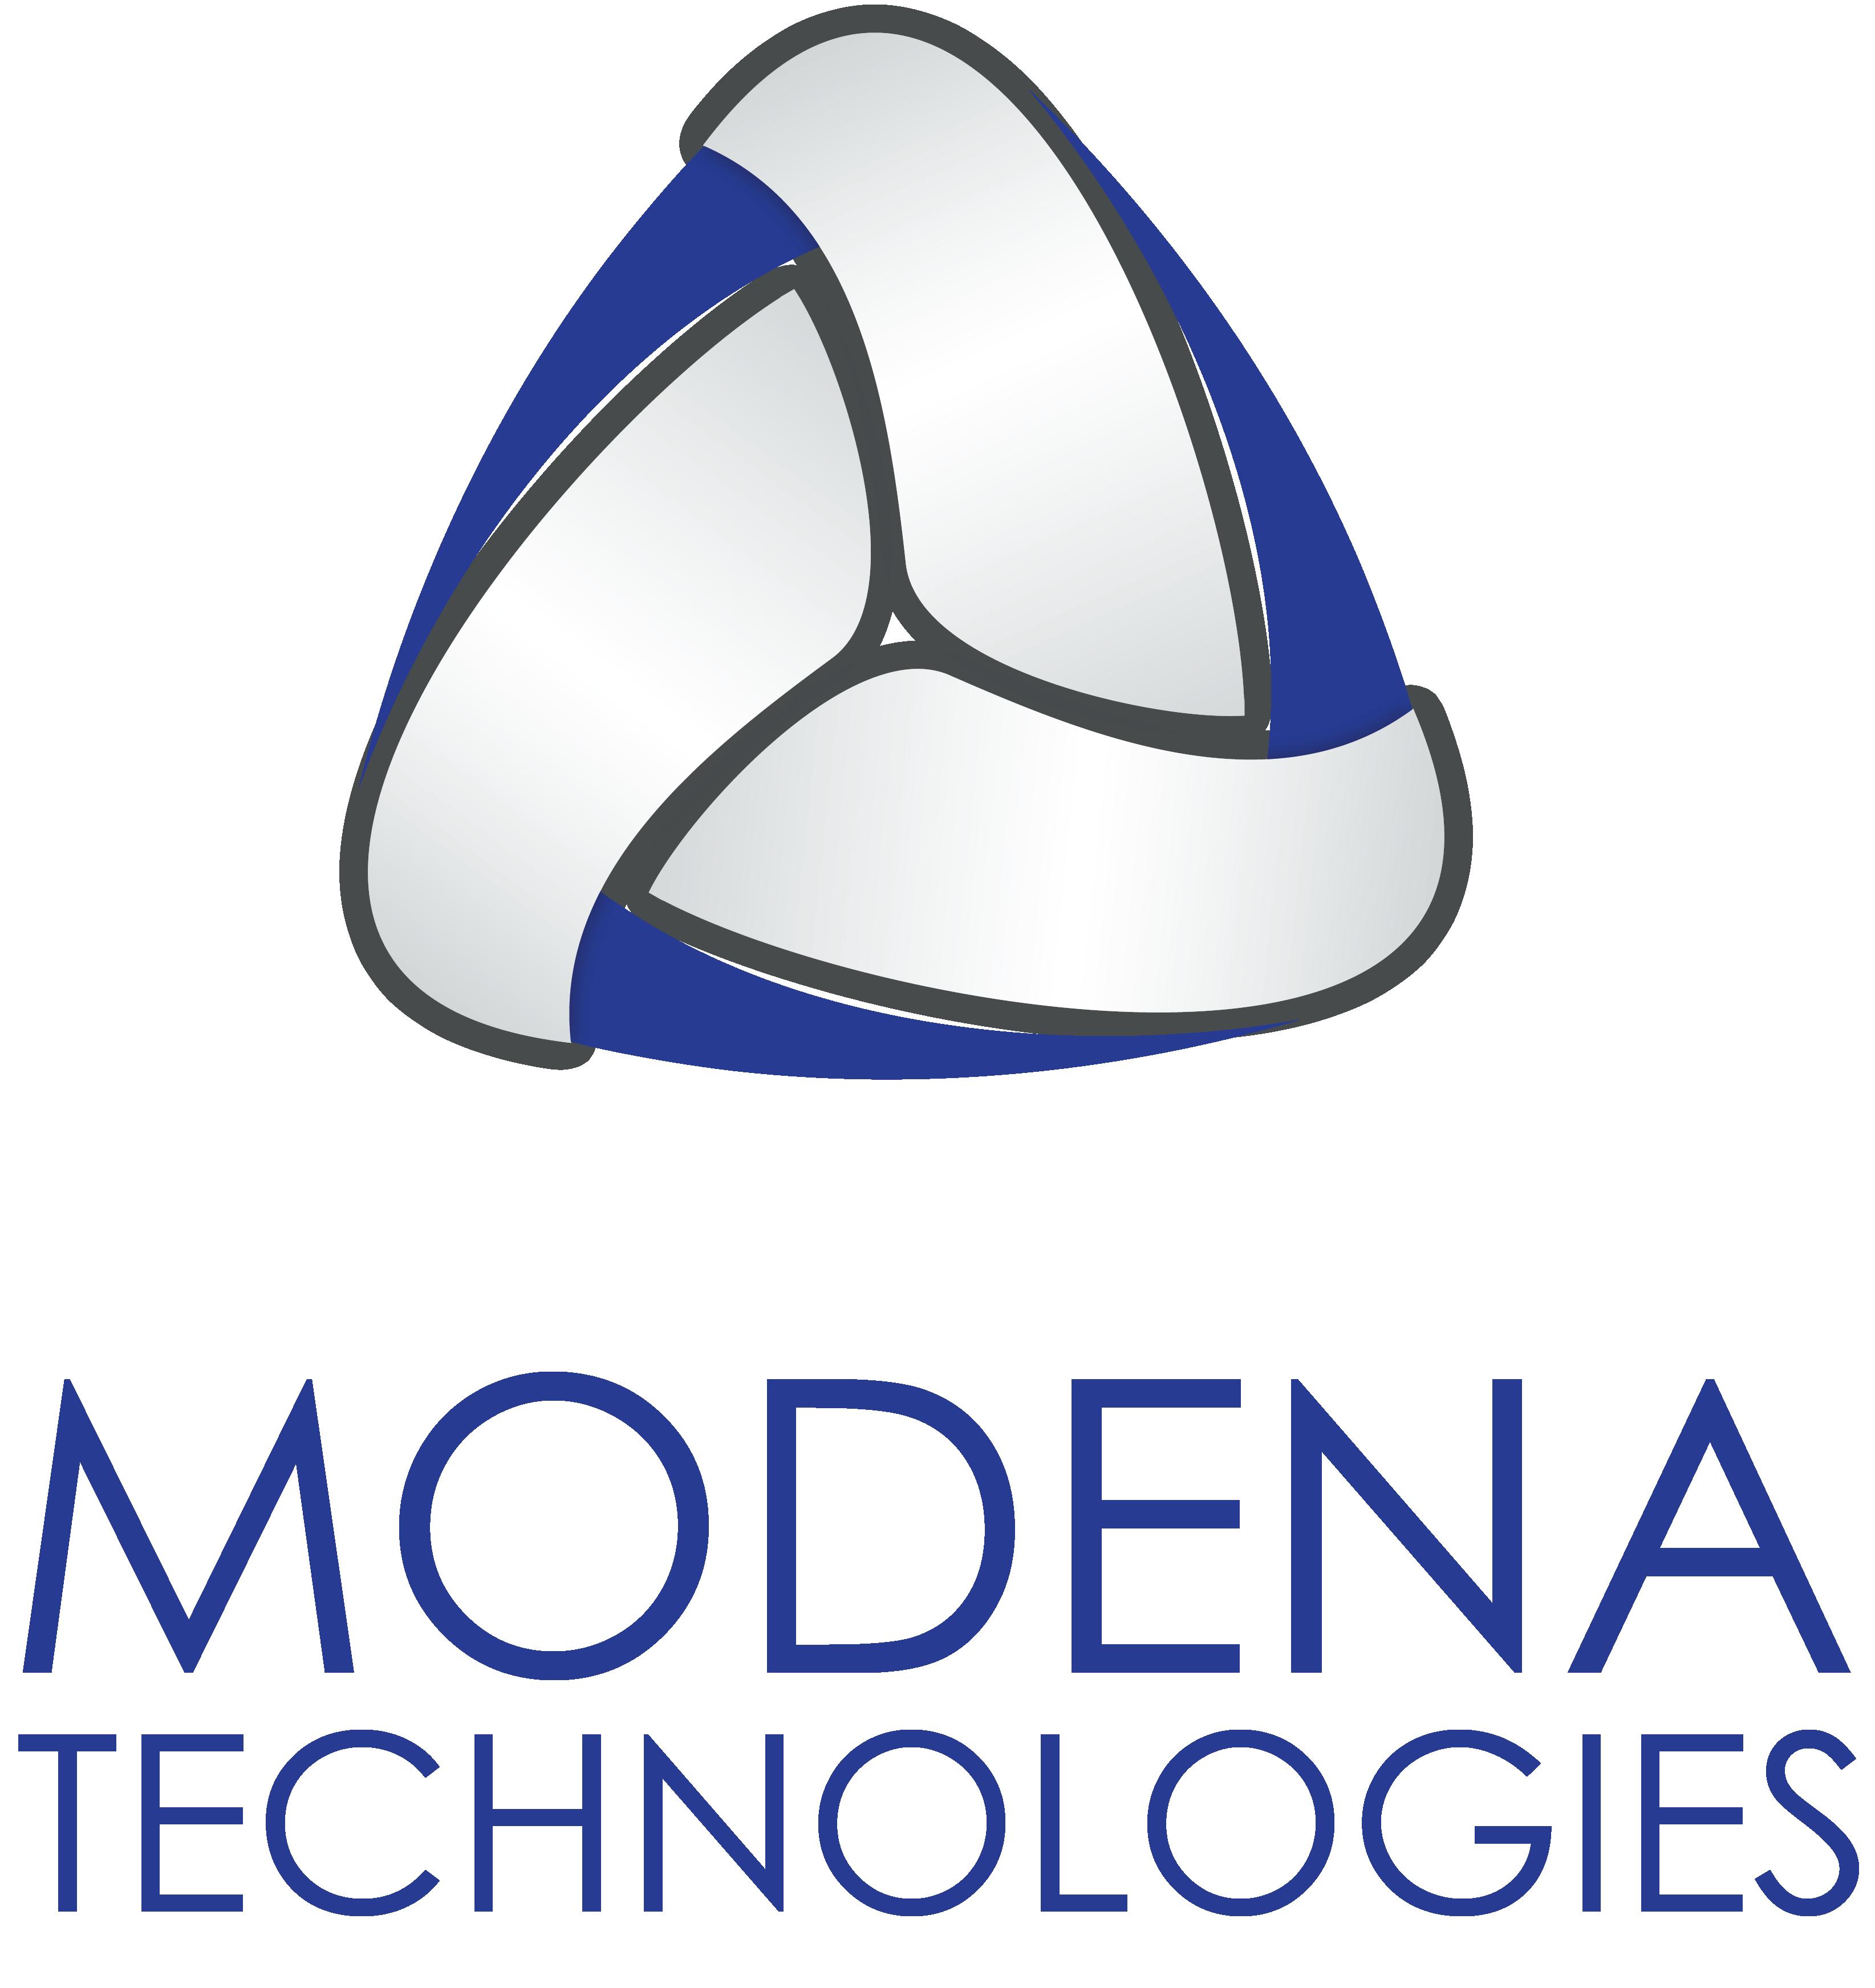 Modena Technologies